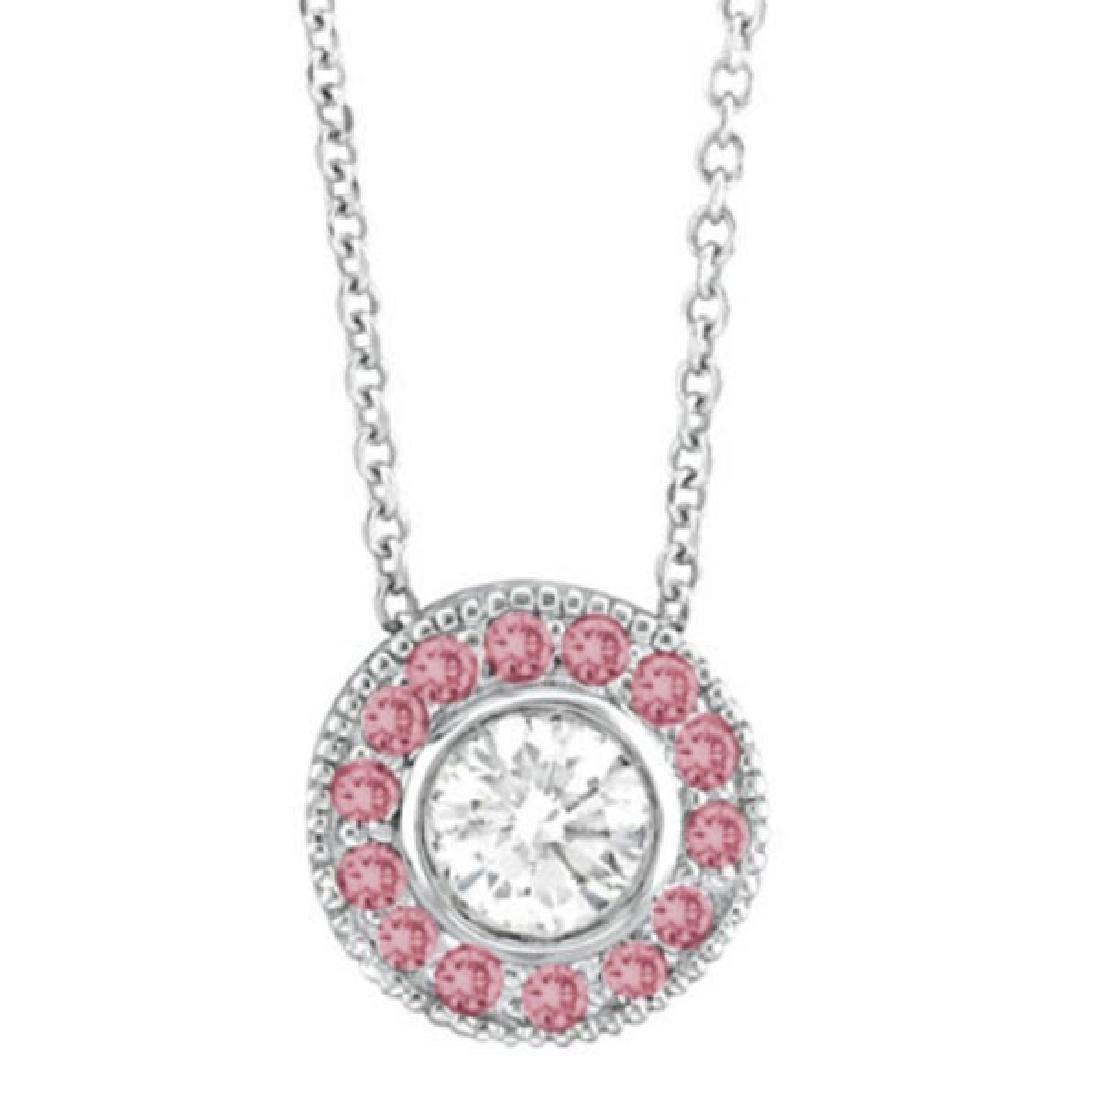 Halo Diamond & Pink Tourmaline Circle Pendant Necklace